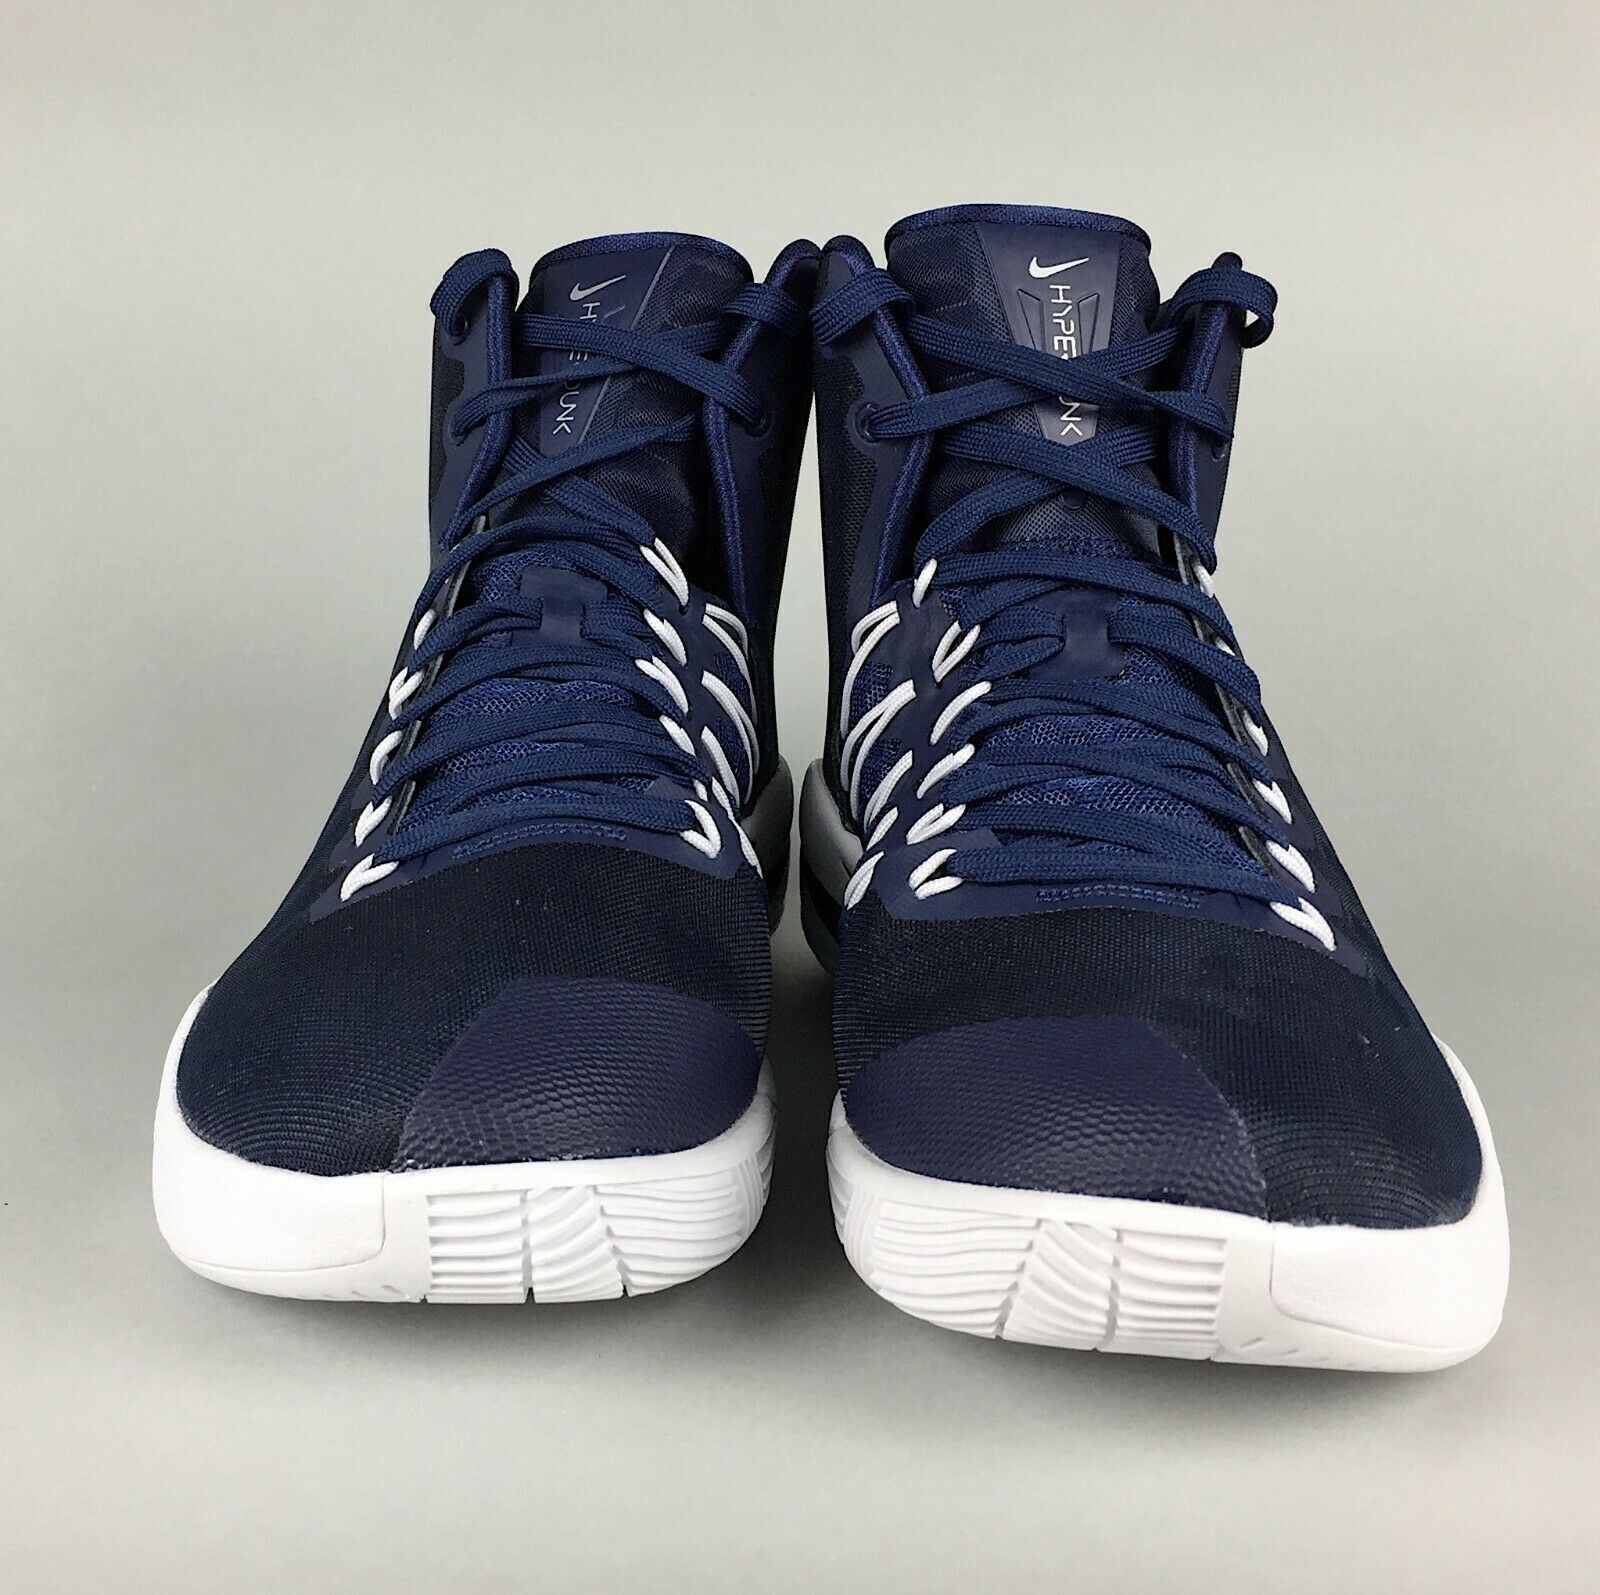 New Men's Nike Hyperdunk 2016 Basketball Shoe Size 11.5 Blue White 856483-442 image 3